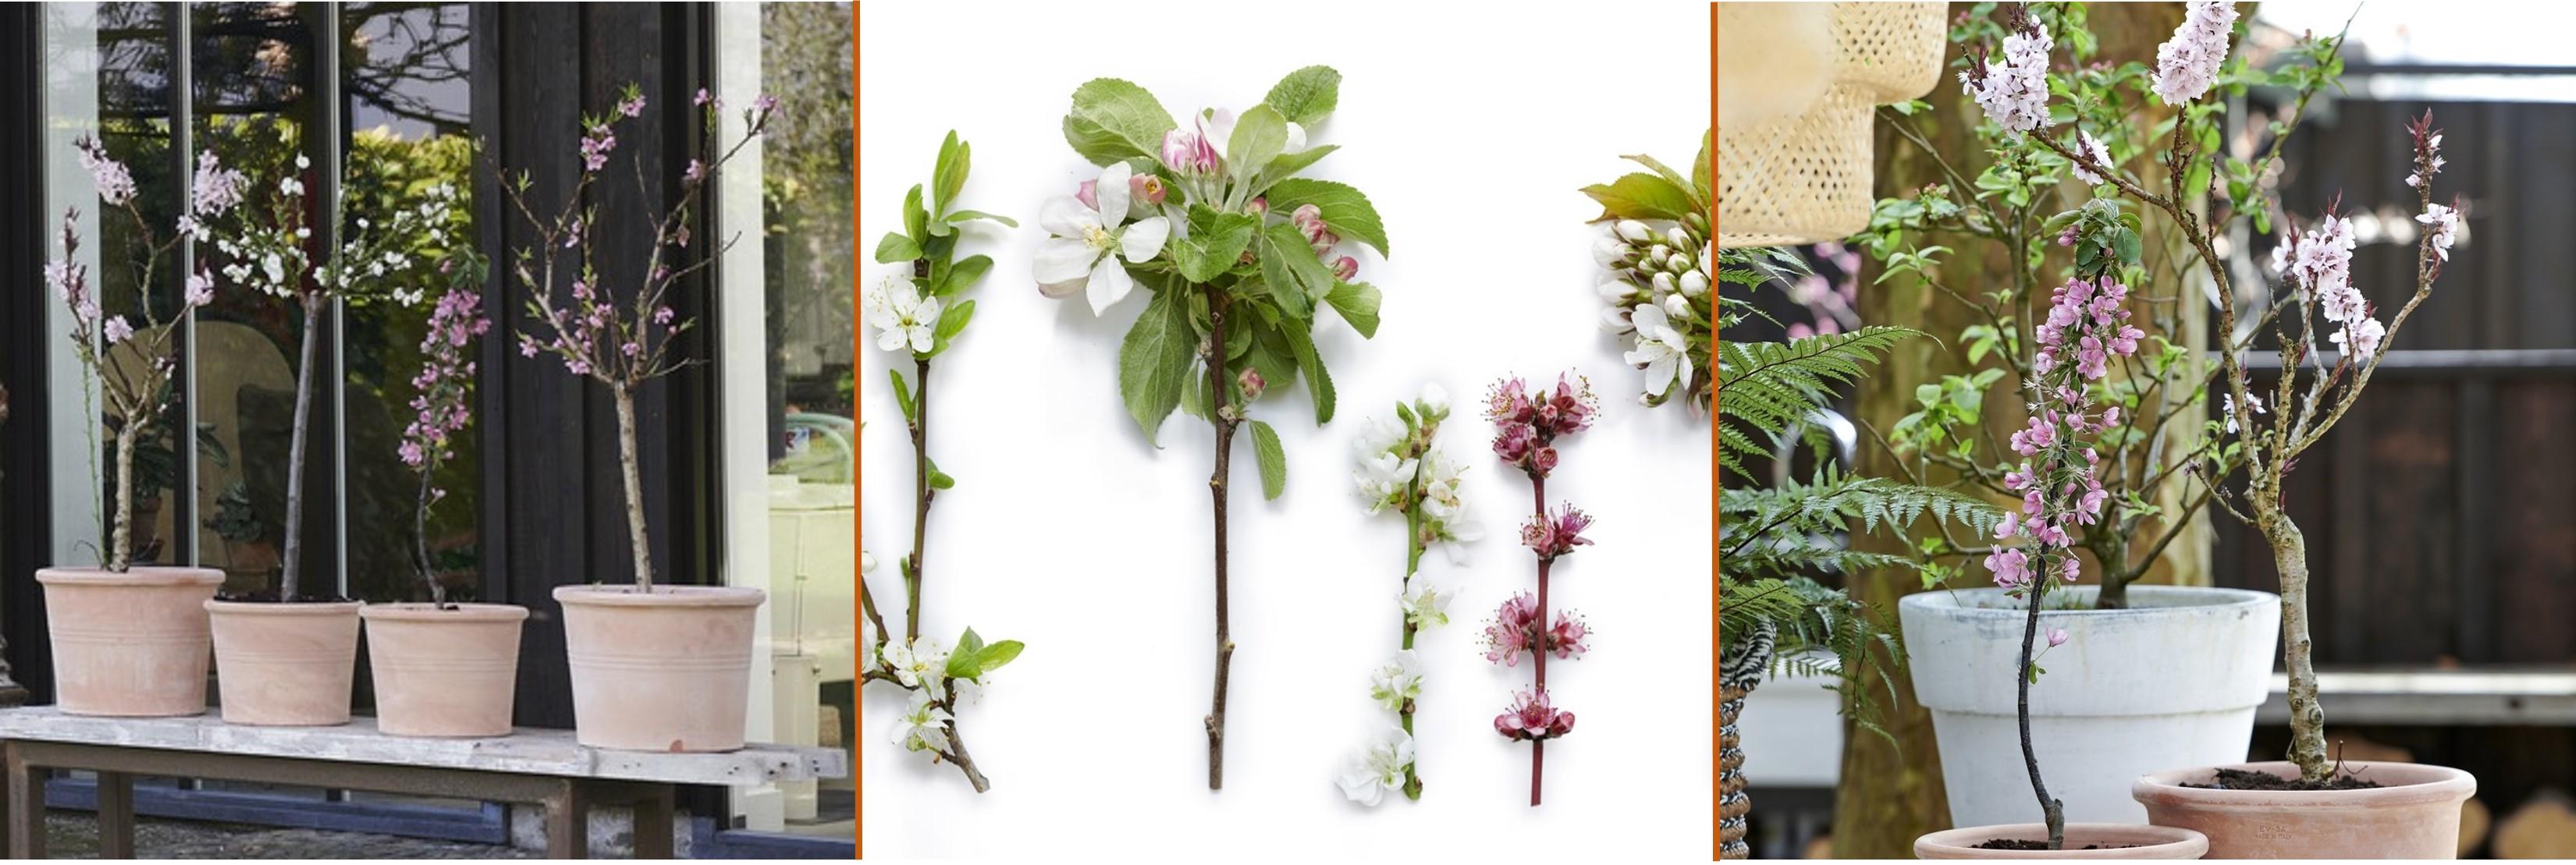 Gartenpflanzen des Monats März: Blütenbäume